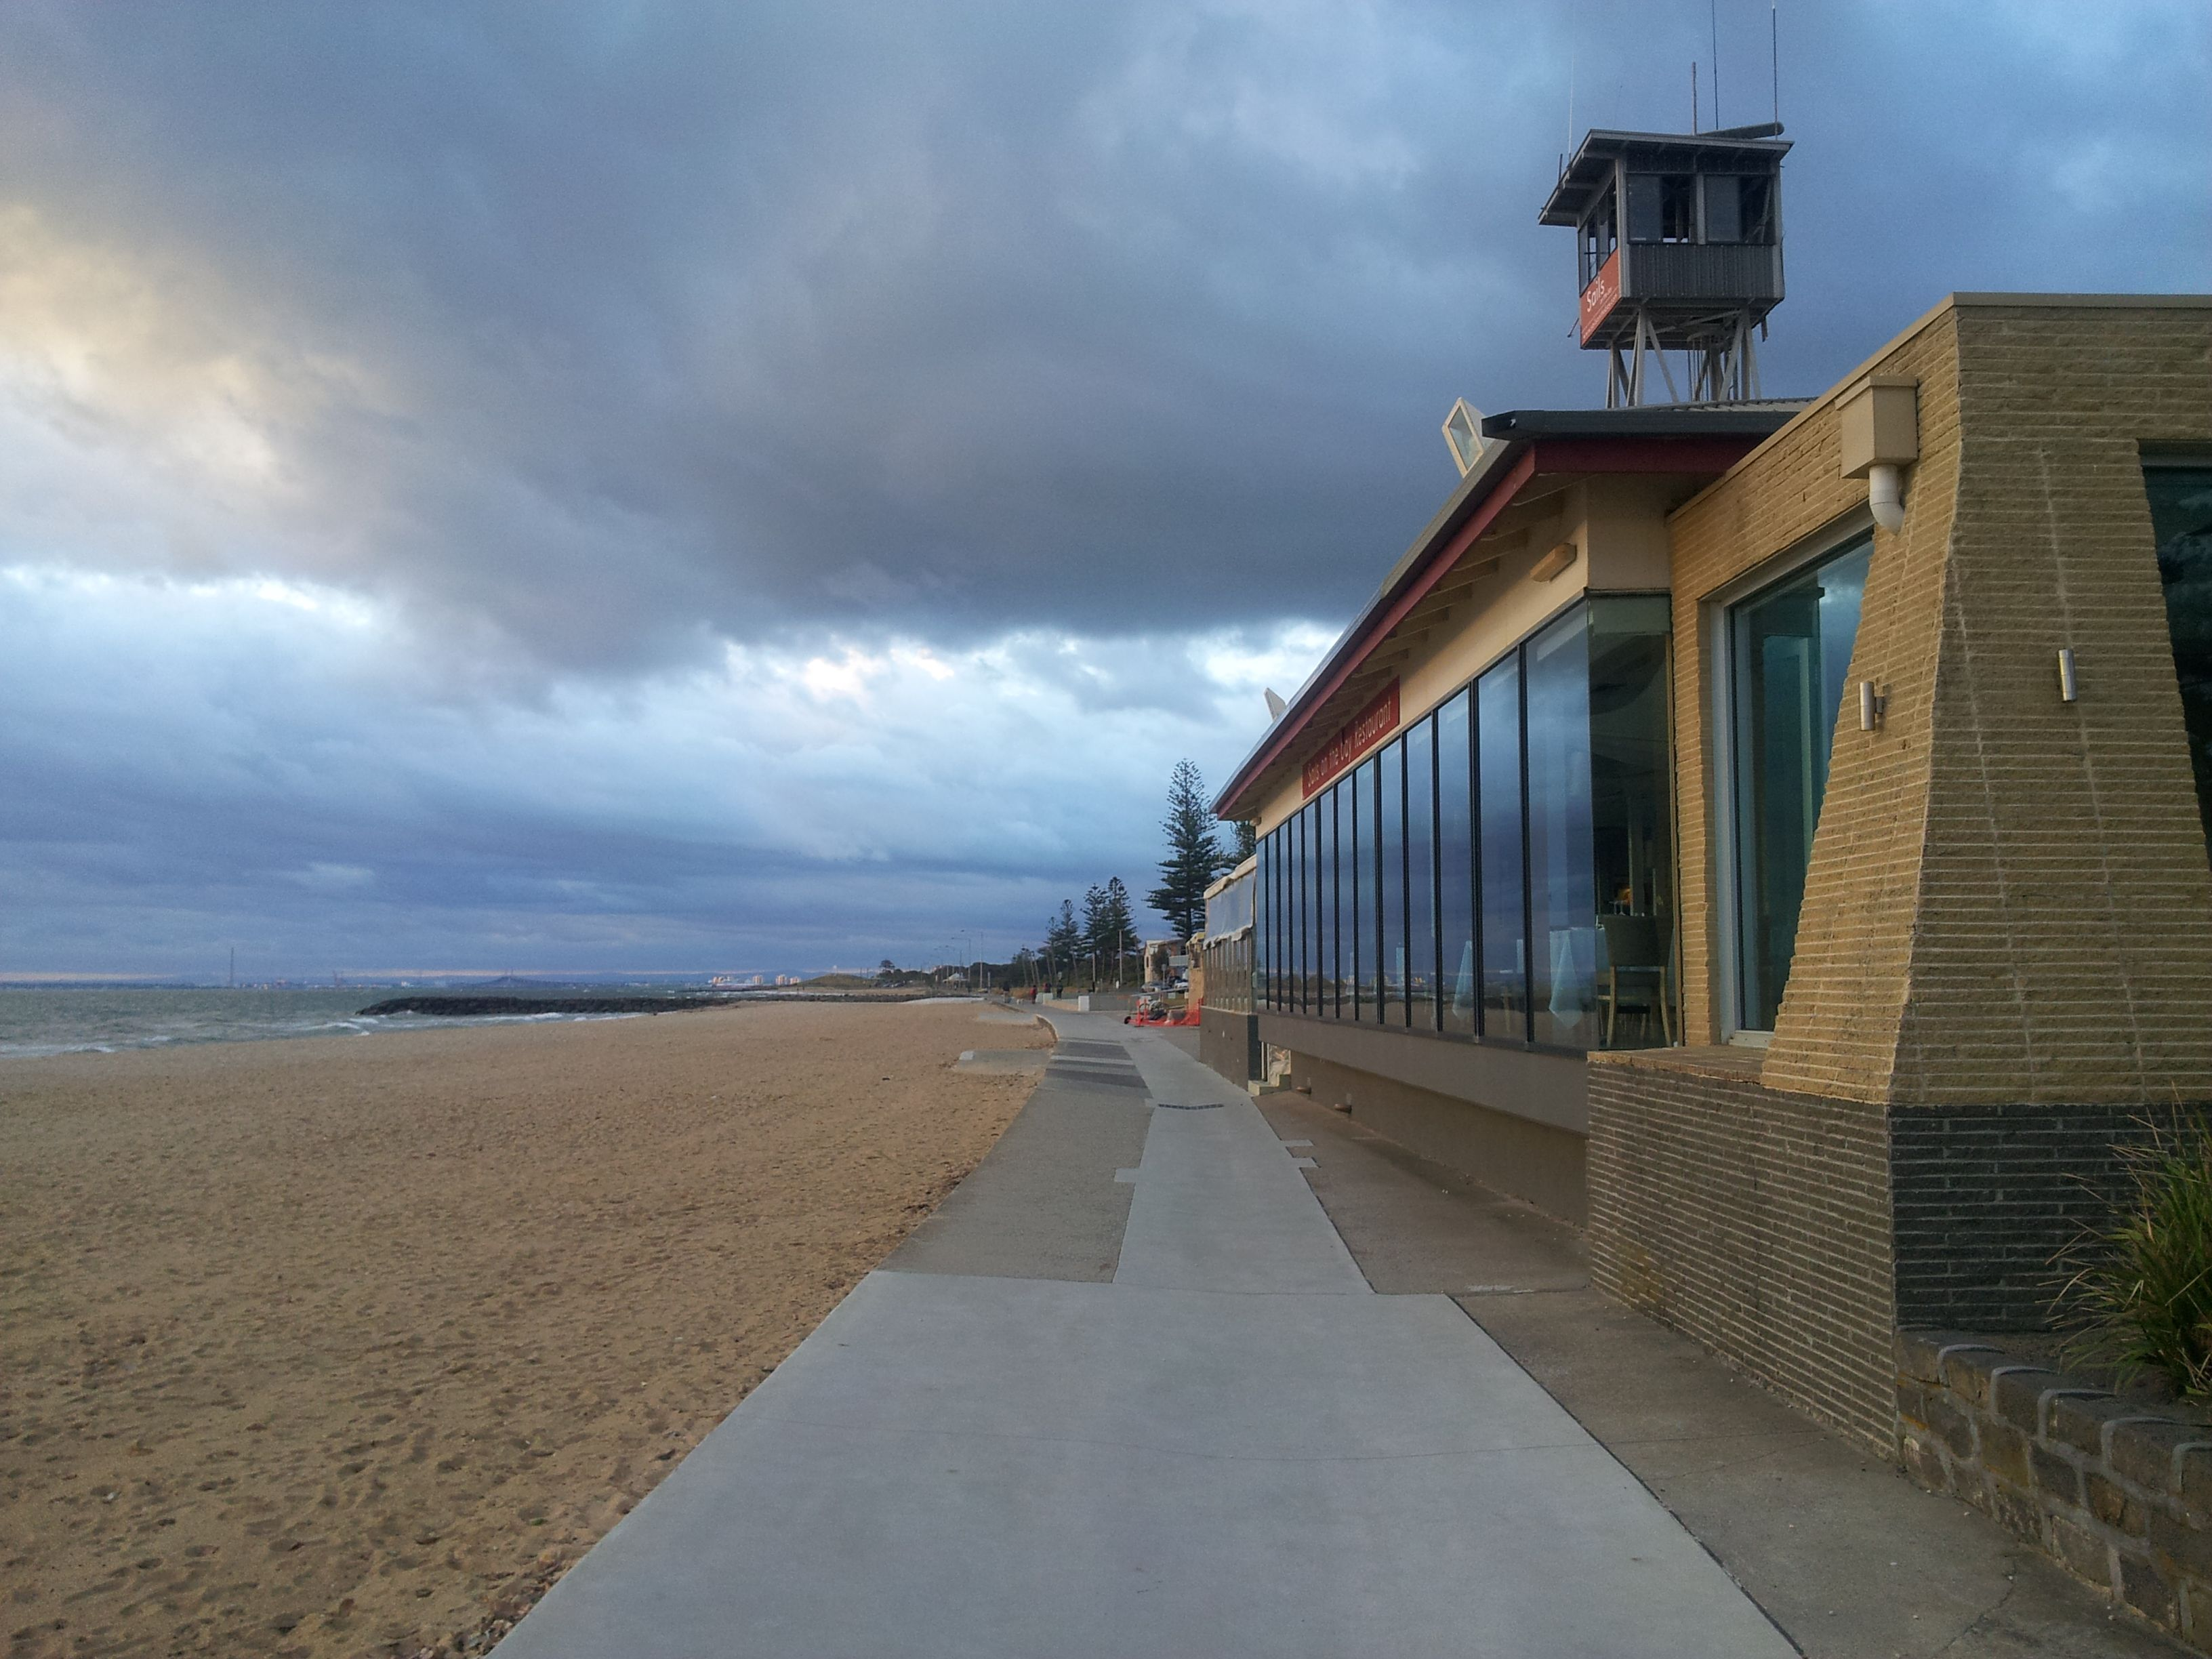 Sails On The Bay (Elwood Beach), Elwood, Victoria. Www.top